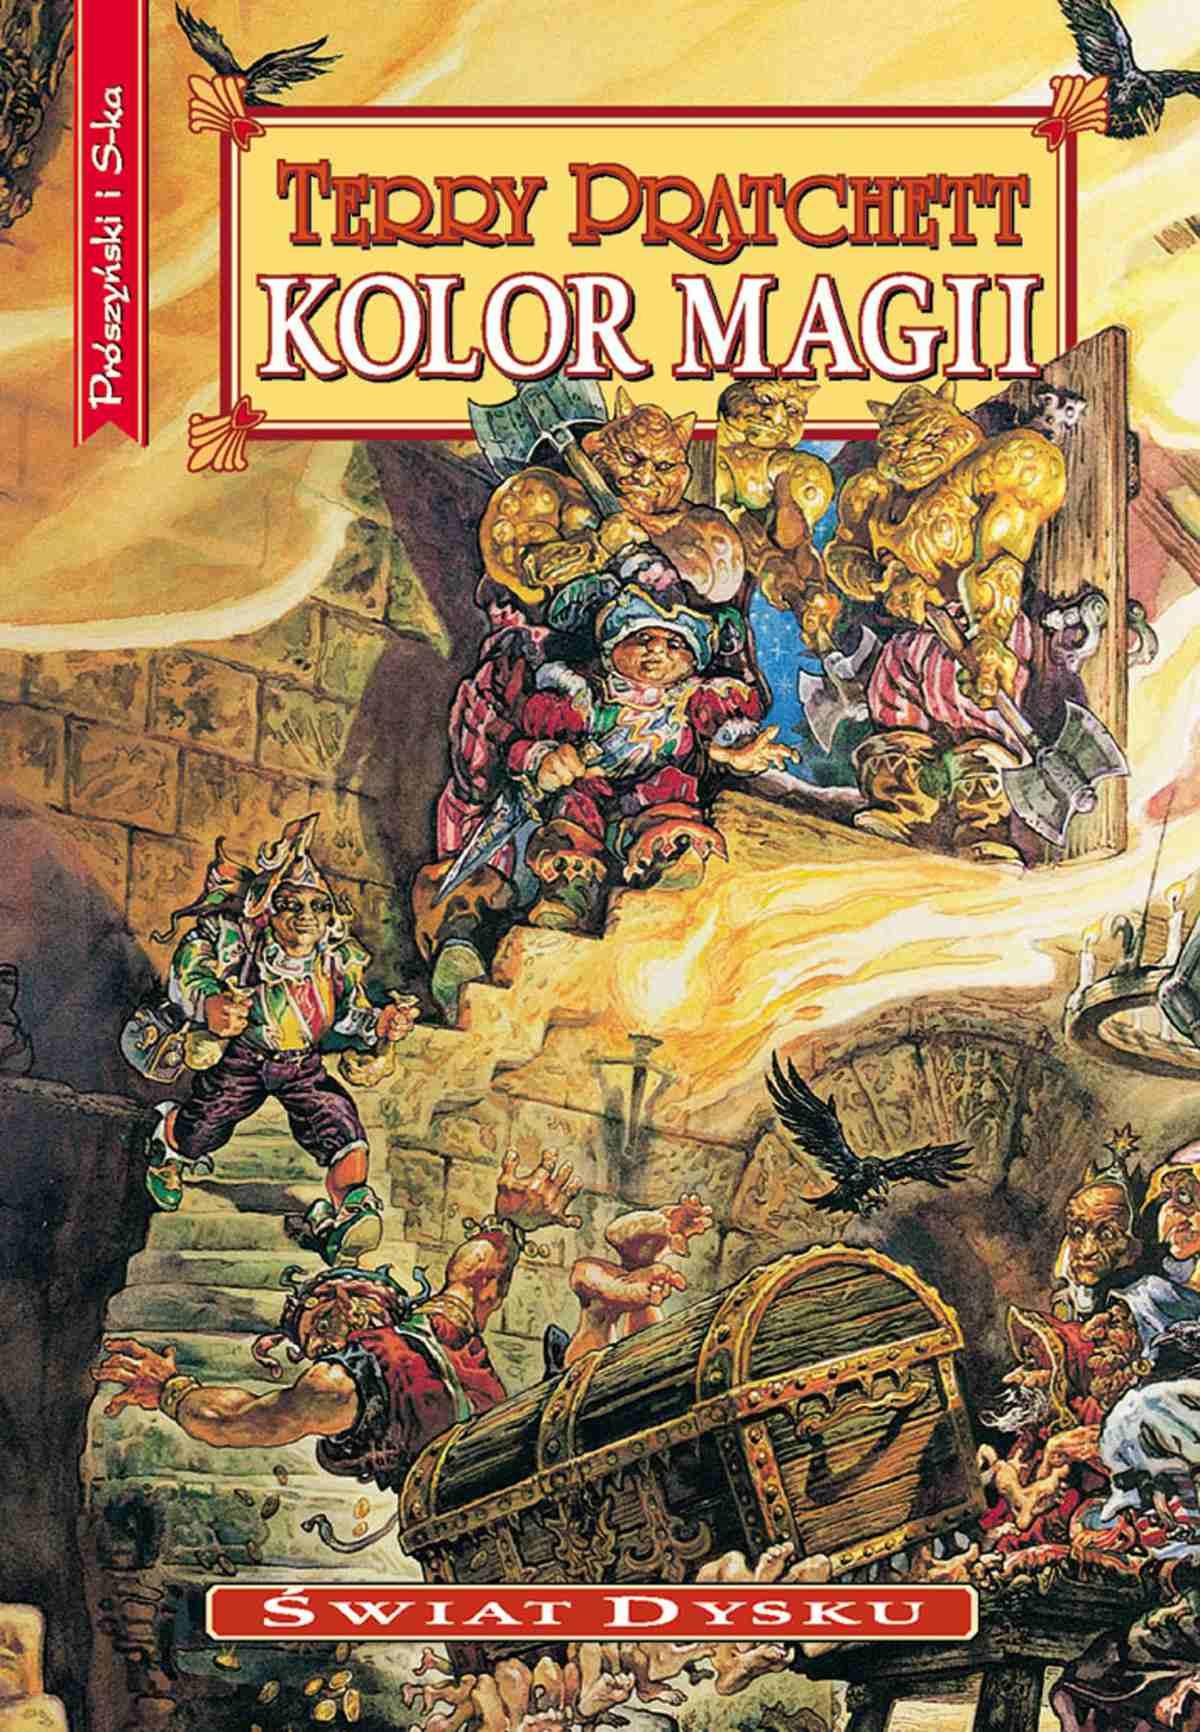 Kolor magii - Ebook (Książka na Kindle) do pobrania w formacie MOBI